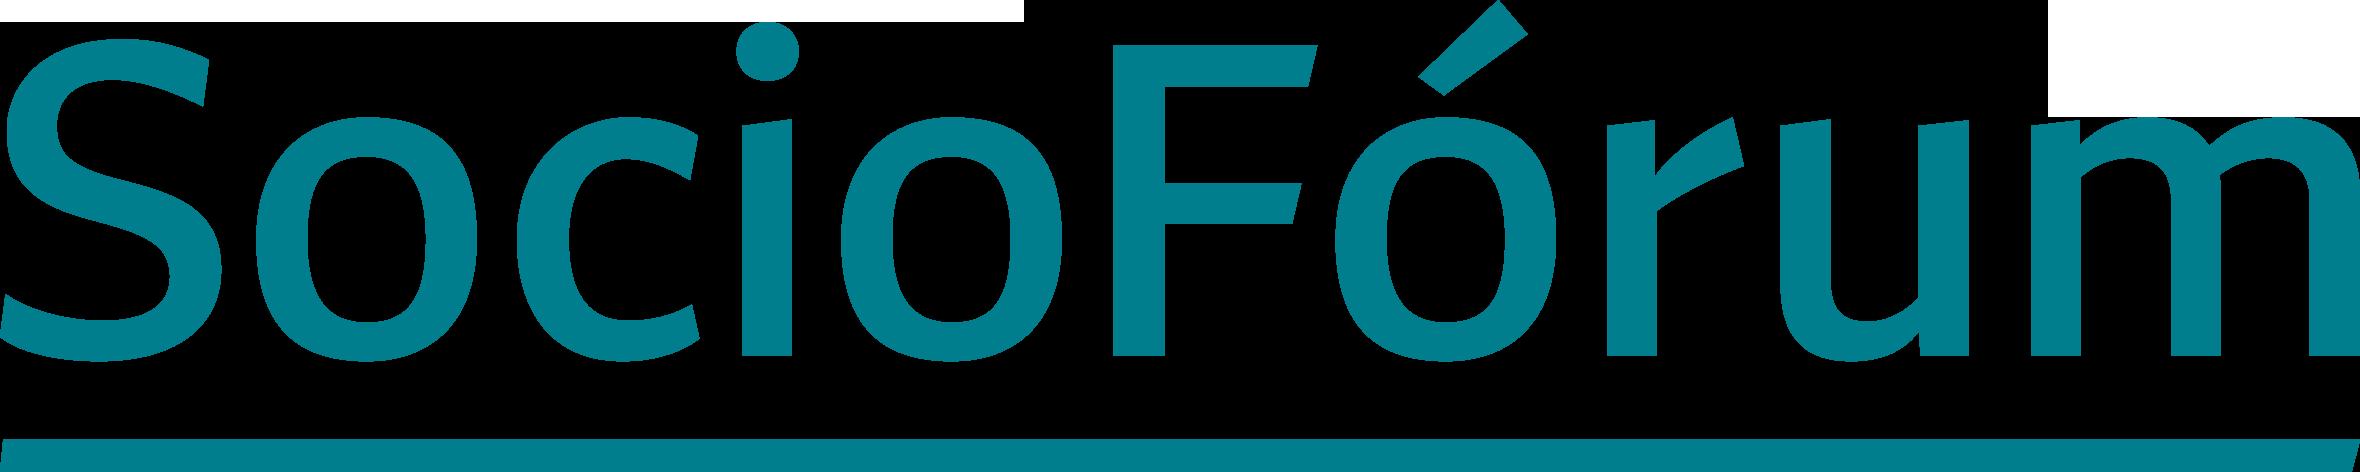 SocioForum_logo2014_RGB